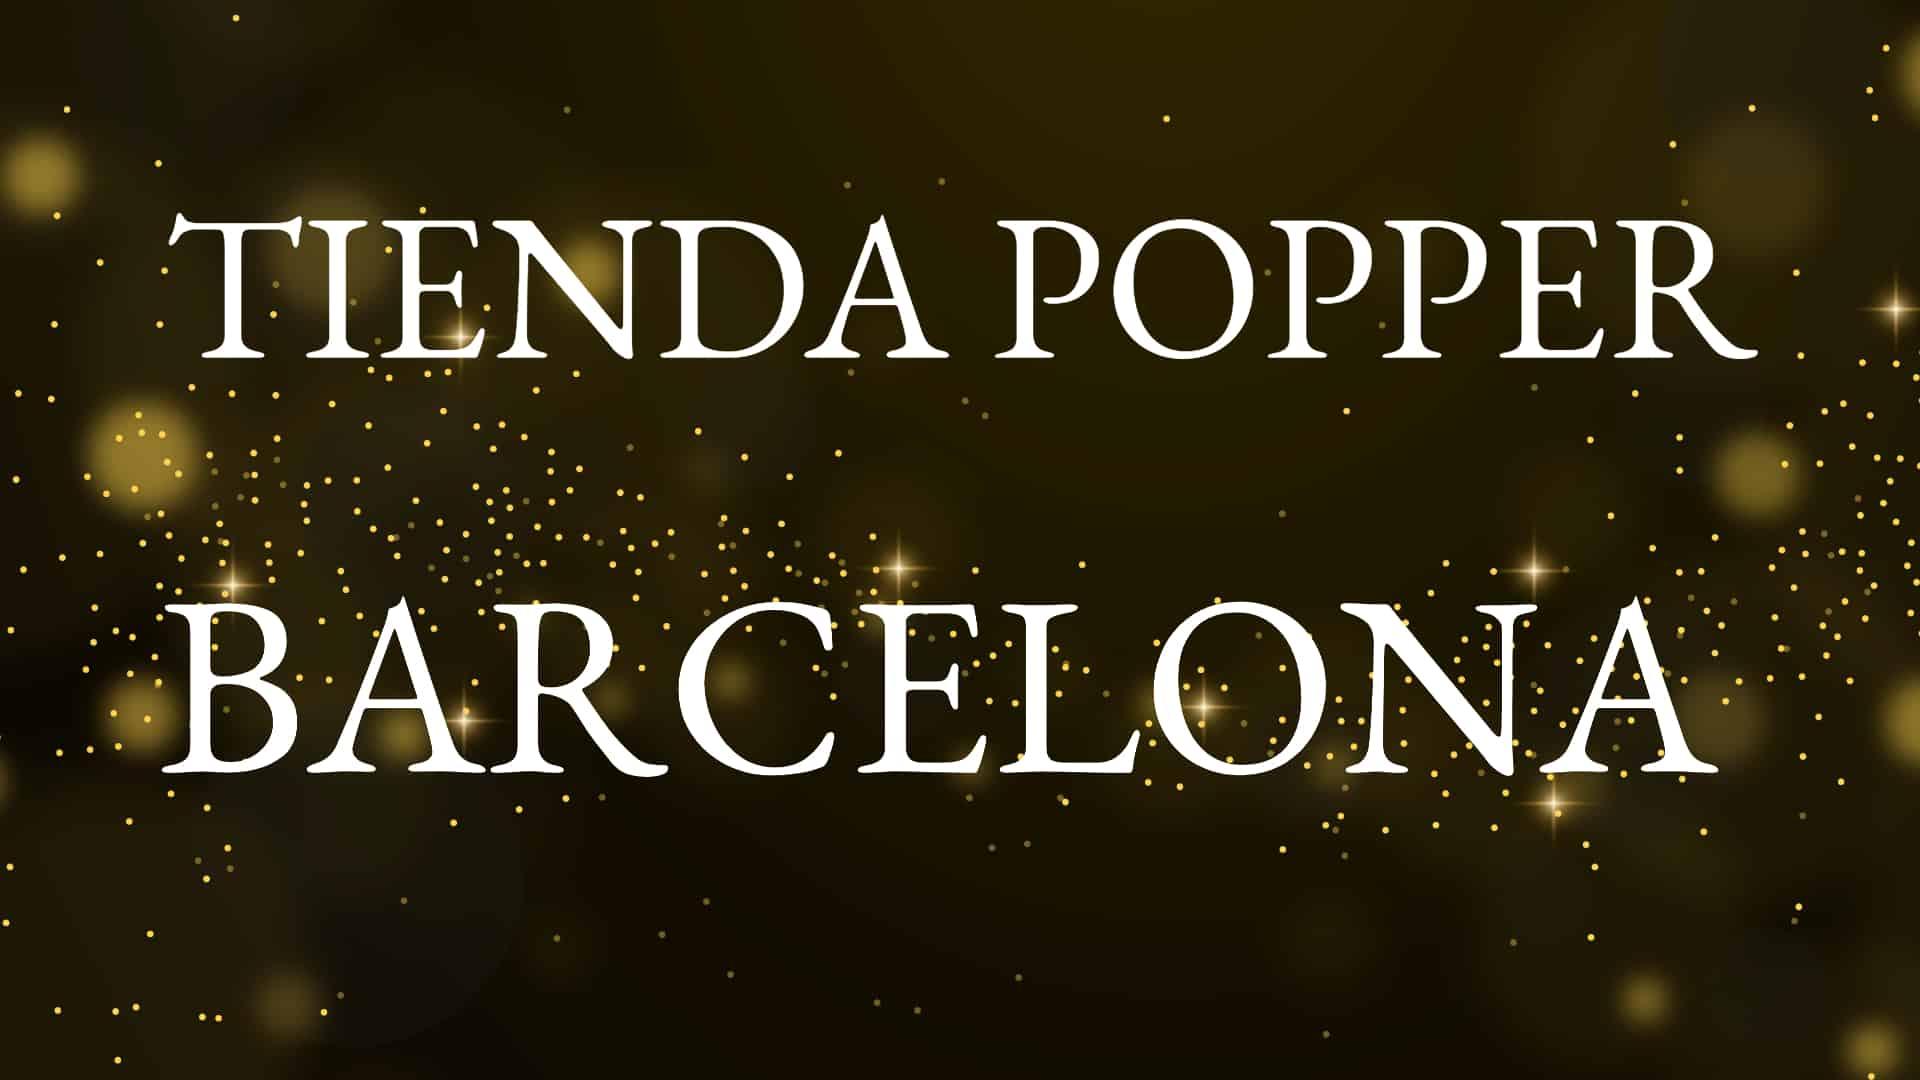 tienda popper barcelona imagen del post